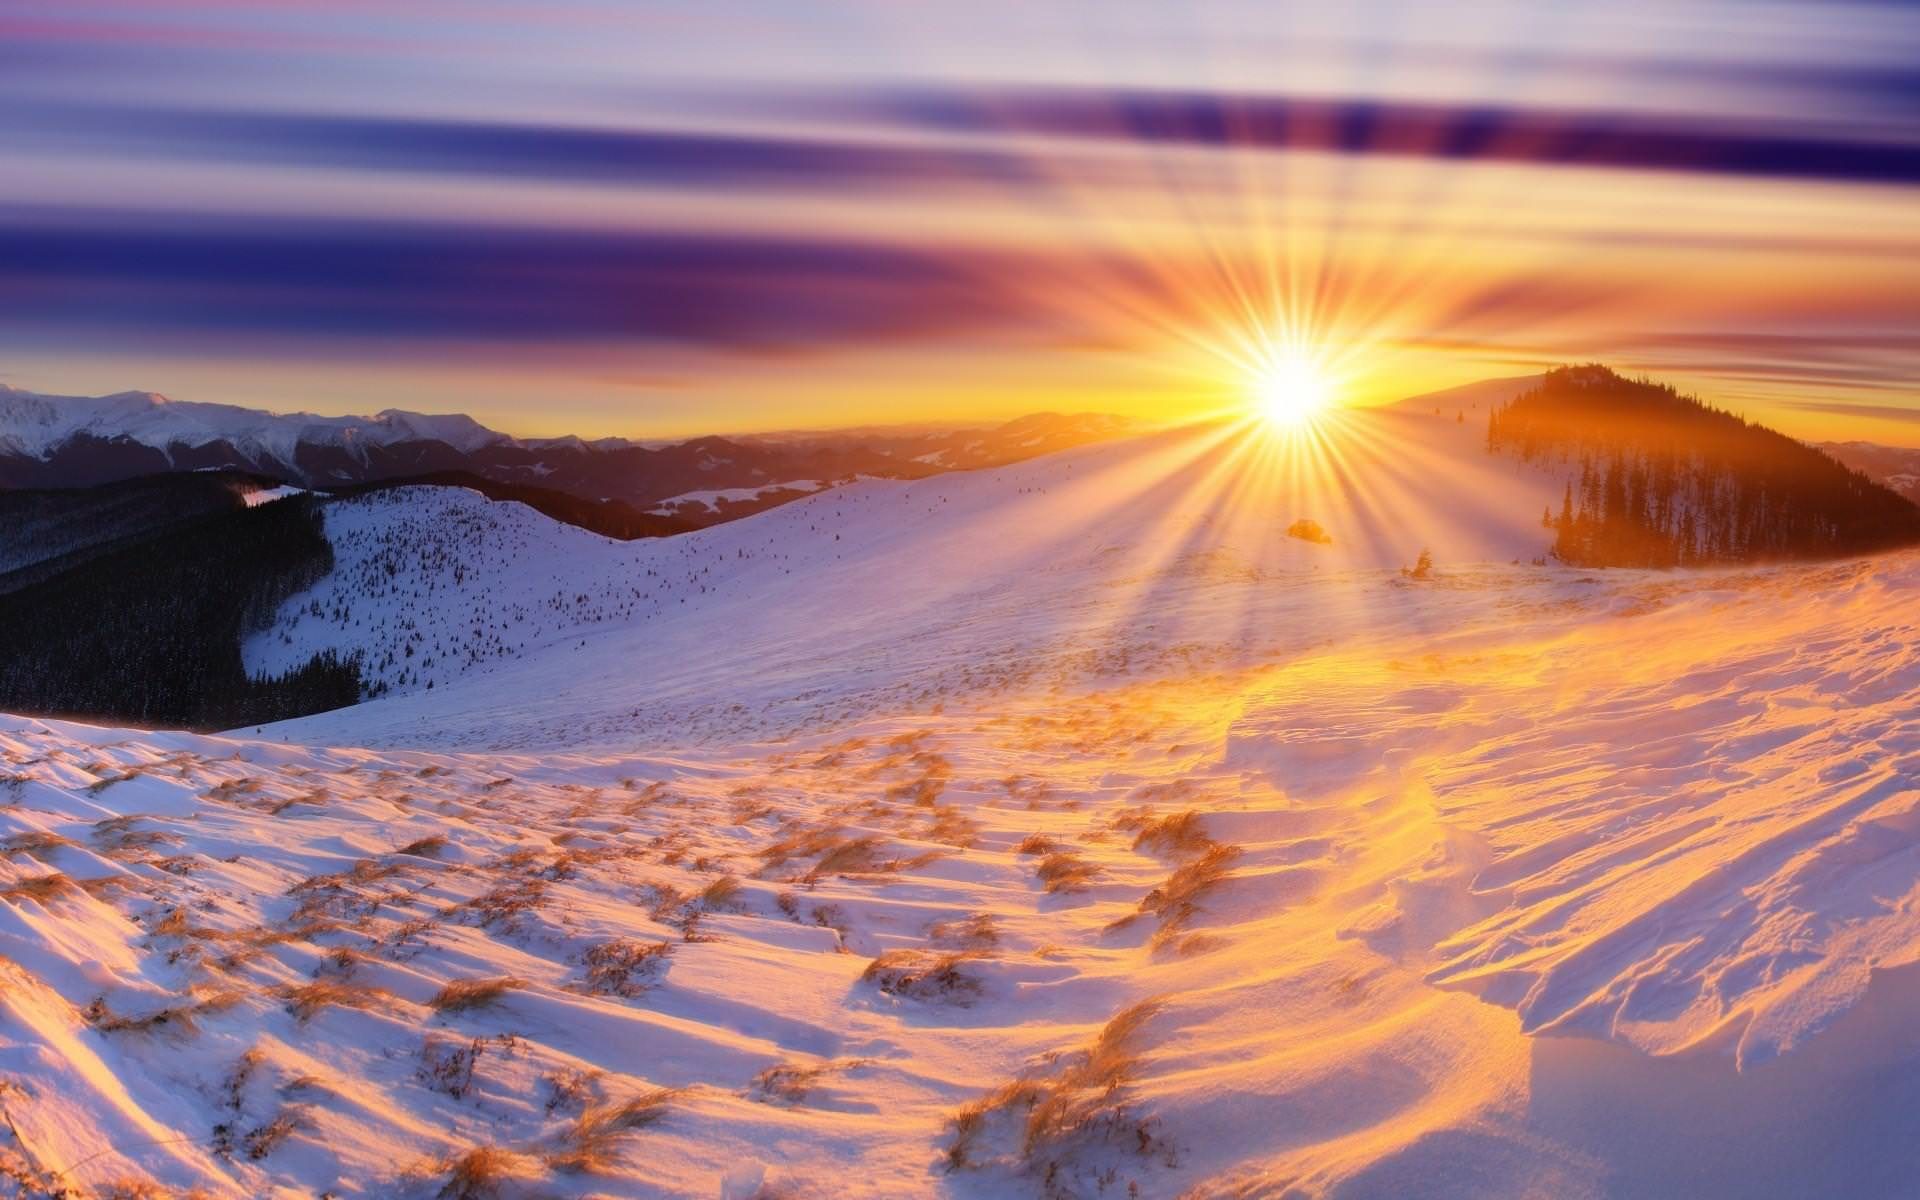 Spectacular Winter Sunrise Wallpaper